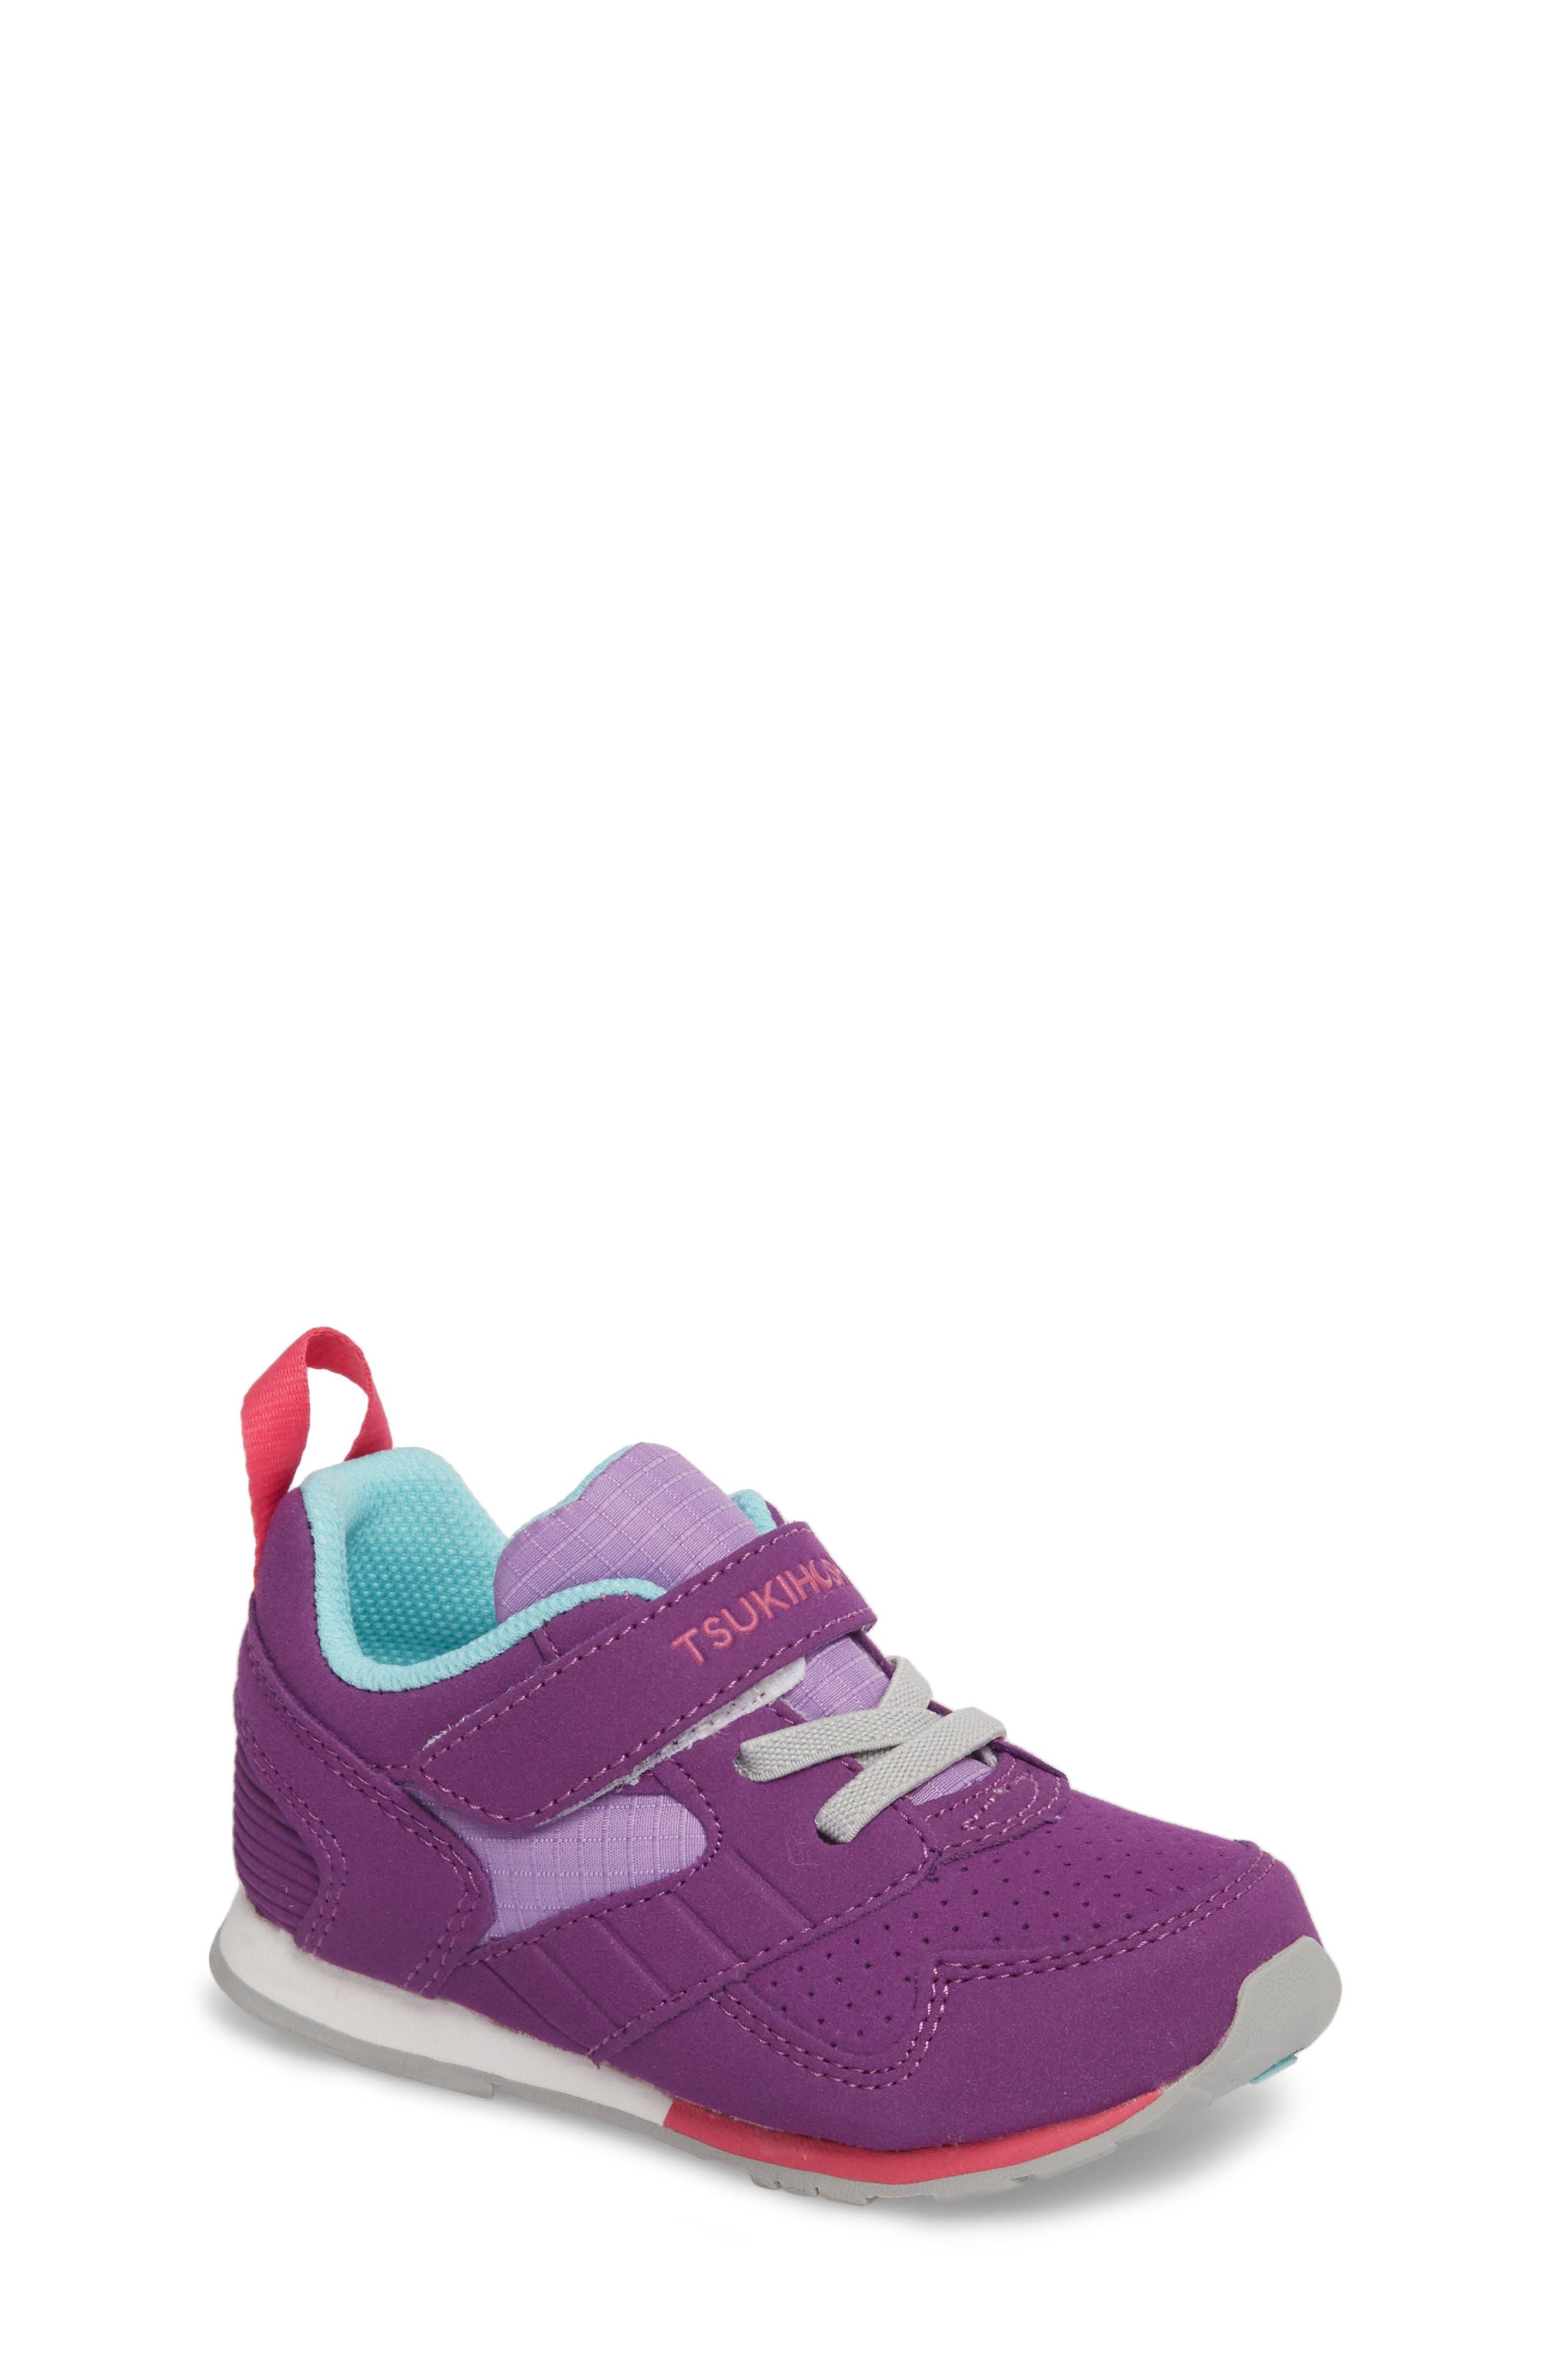 Alternate Image 1 Selected - Tsukihoshi Racer Washable Sneaker (Walker, Toddler & Little Kid)